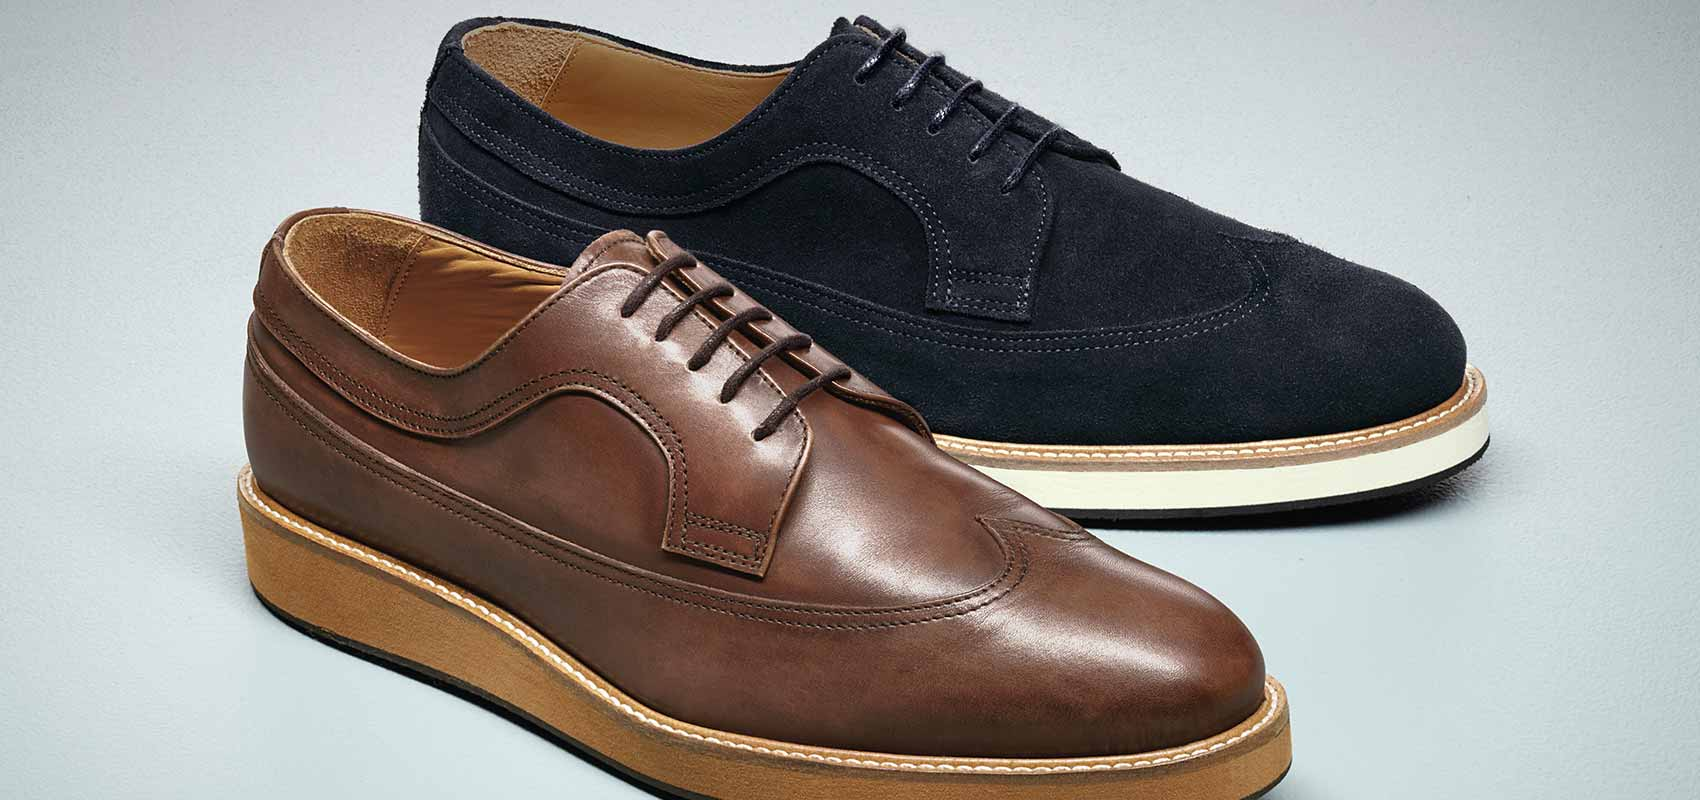 Charles Tyrwhitt Derby shoes